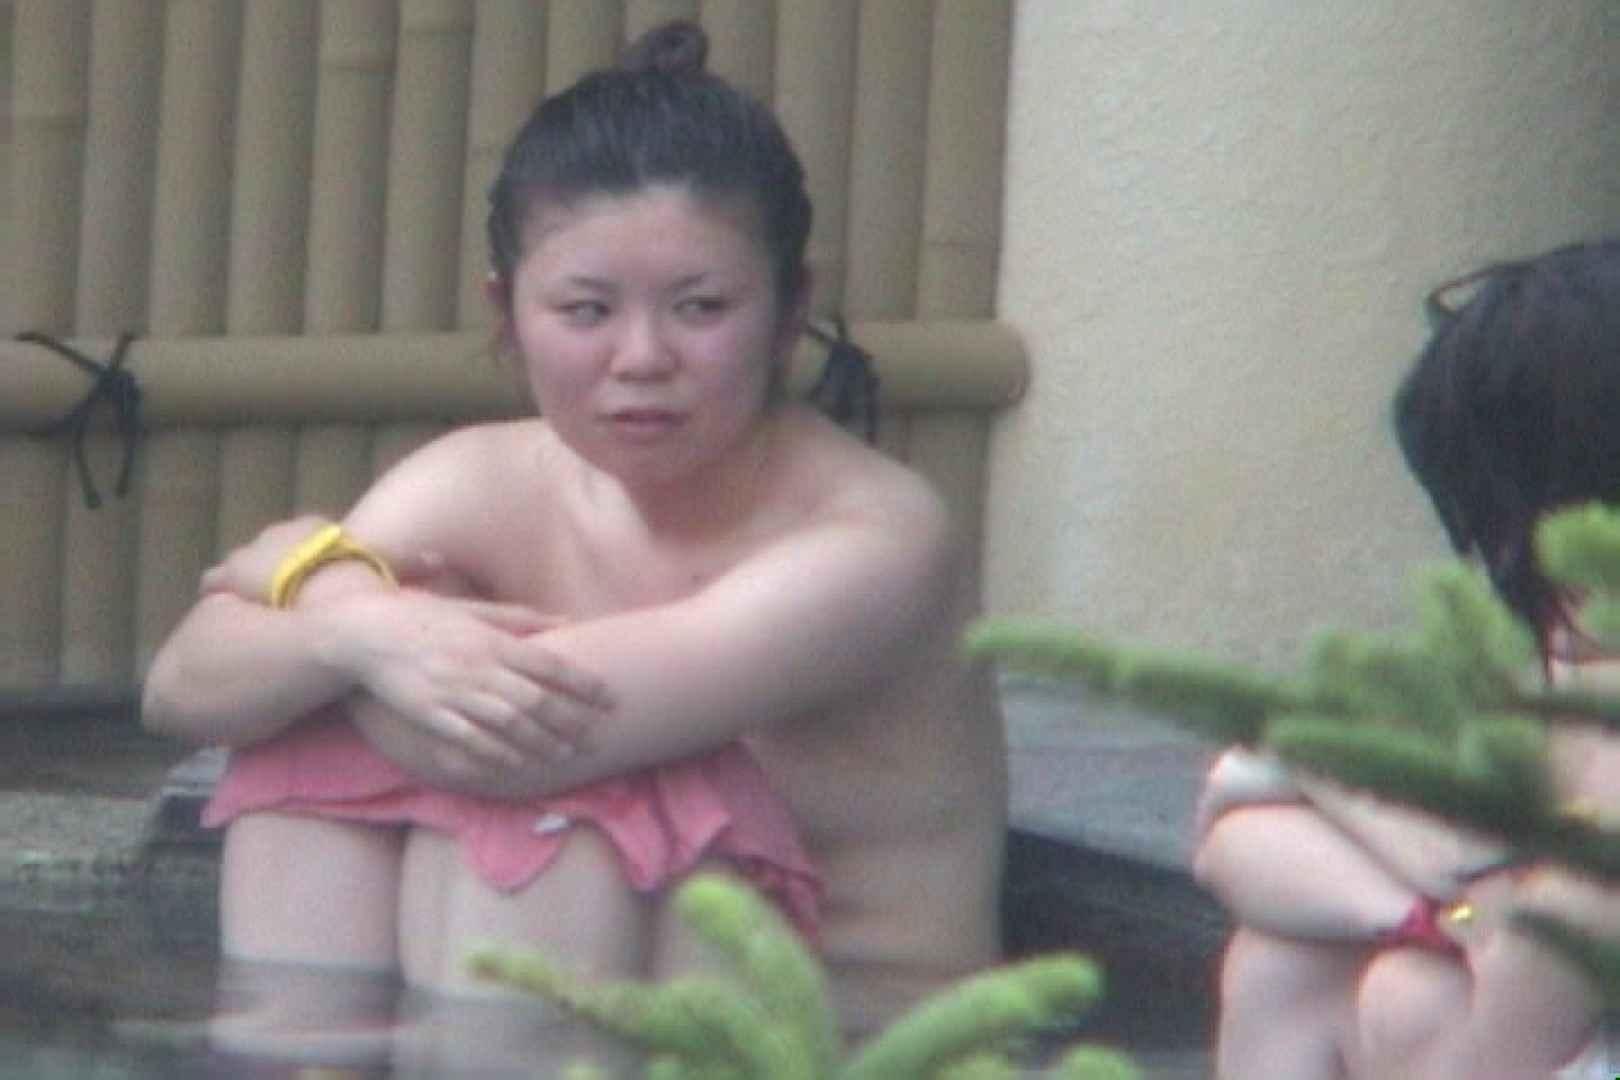 Aquaな露天風呂Vol.47【VIP限定】 盗撮   OLのエロ生活  101連発 10